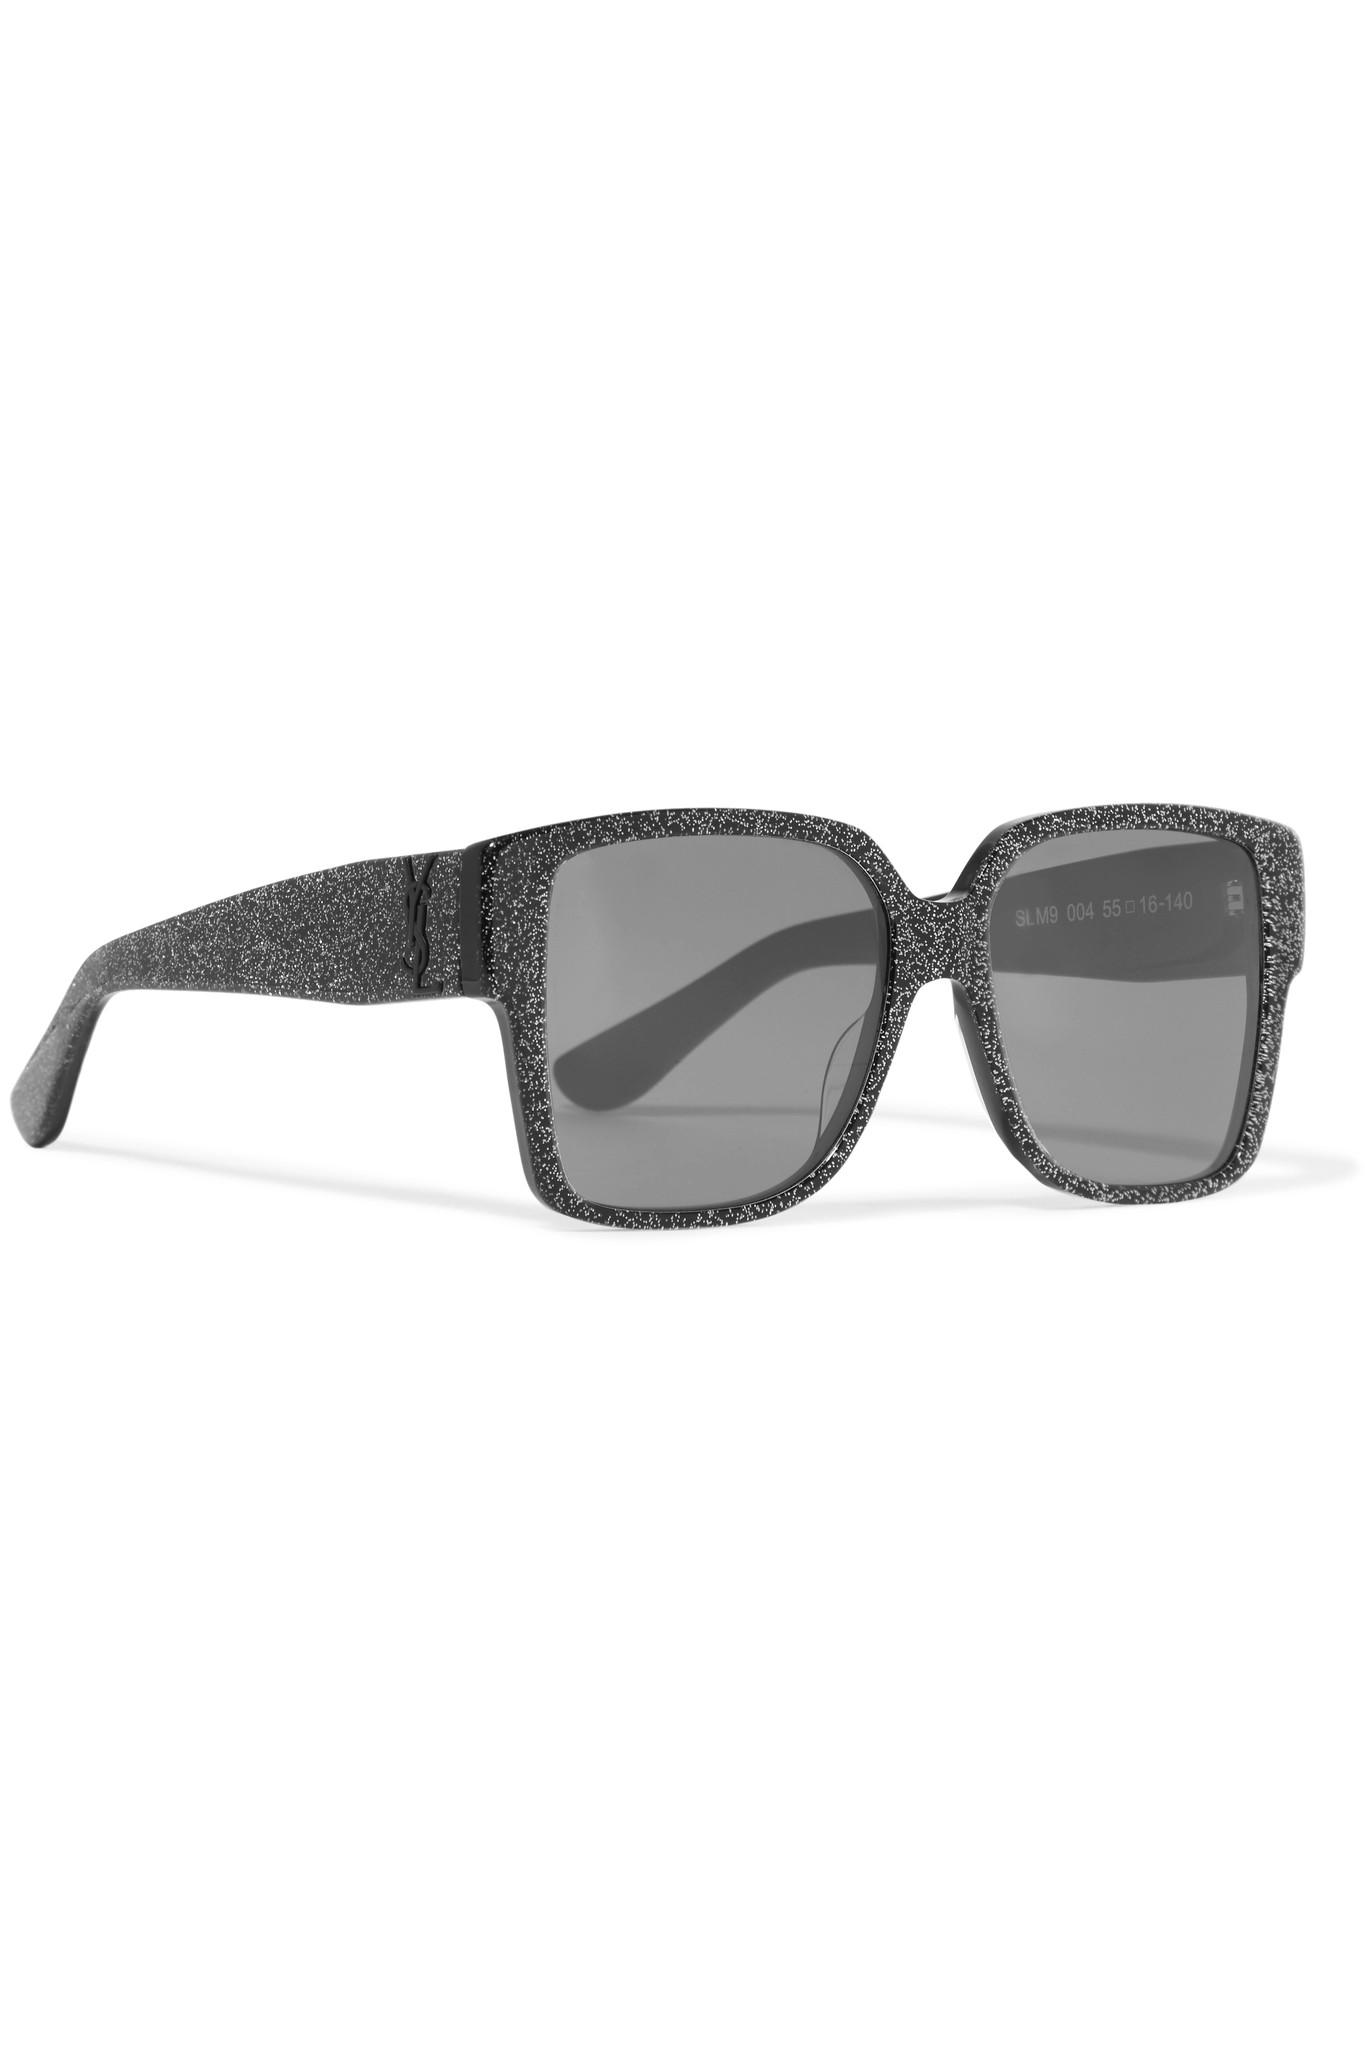 2d744227595 Saint Laurent Oversized Square-frame Glittered Acetate Sunglasses in ...